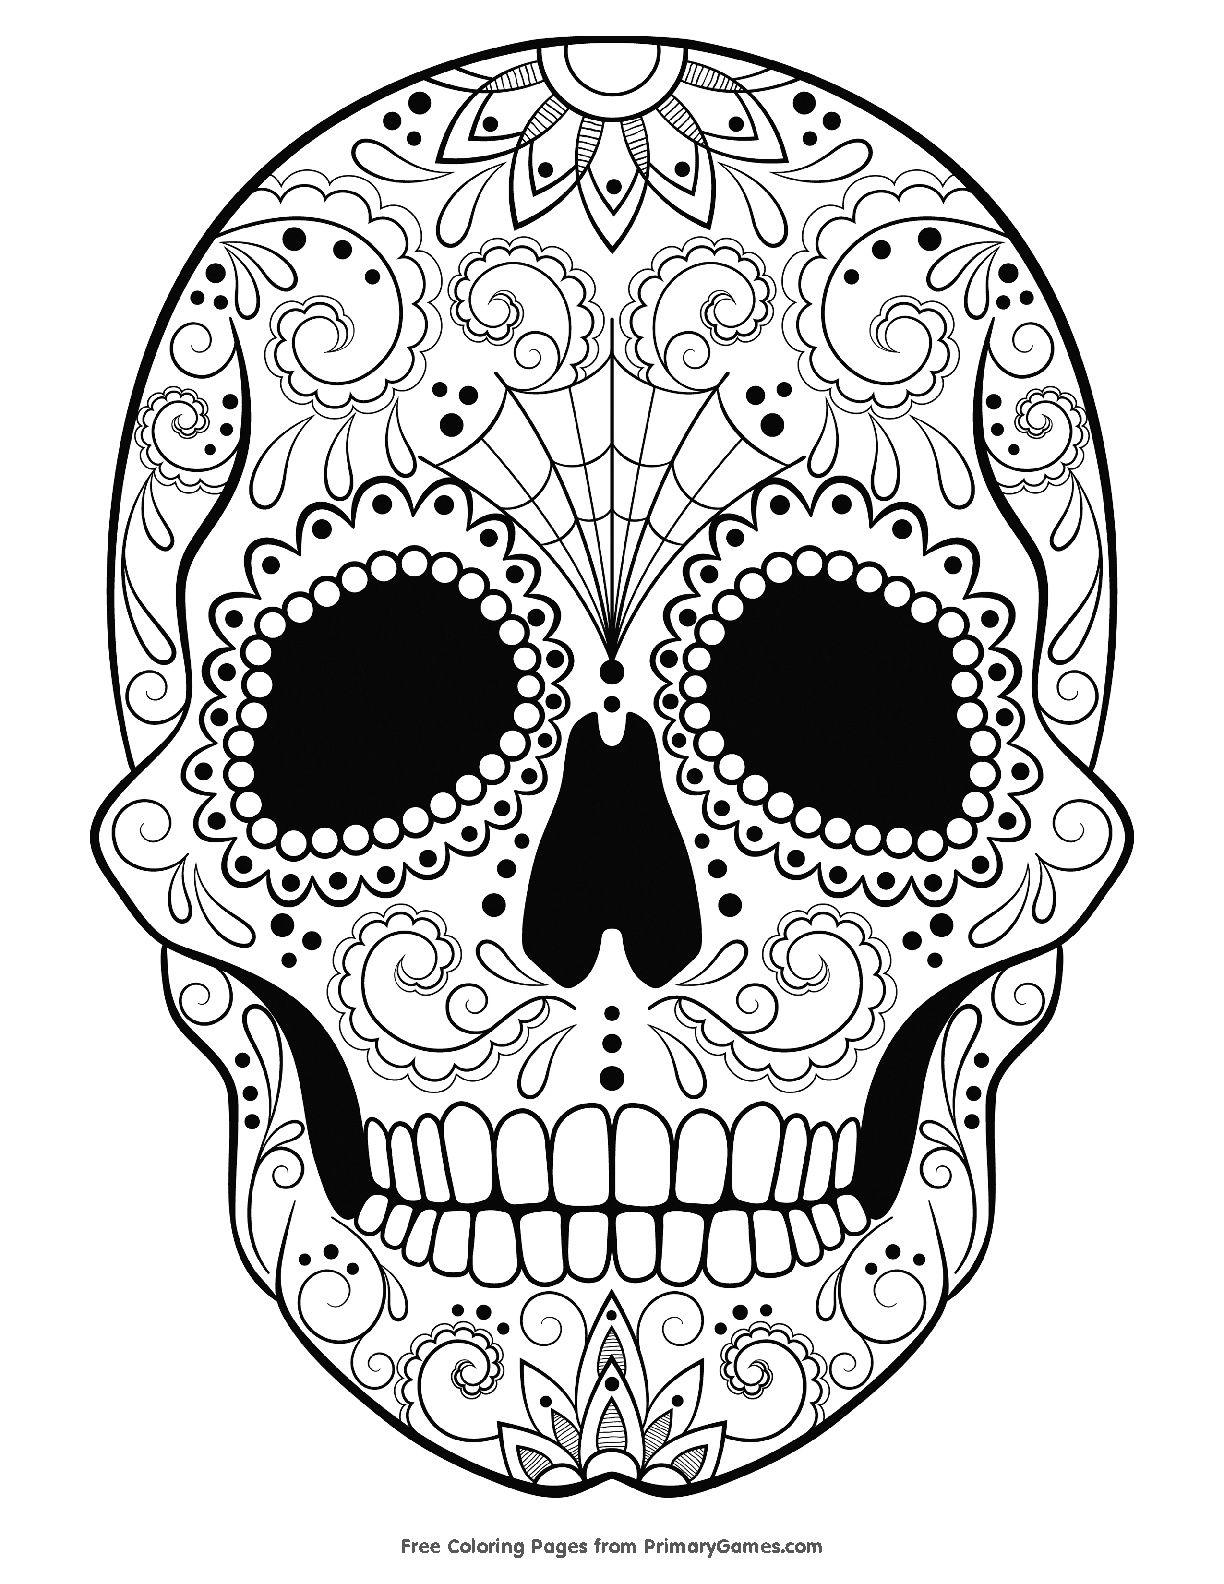 Pin de Rebeca SG en Colorear | Pinterest | Colorear, Dia de las ...